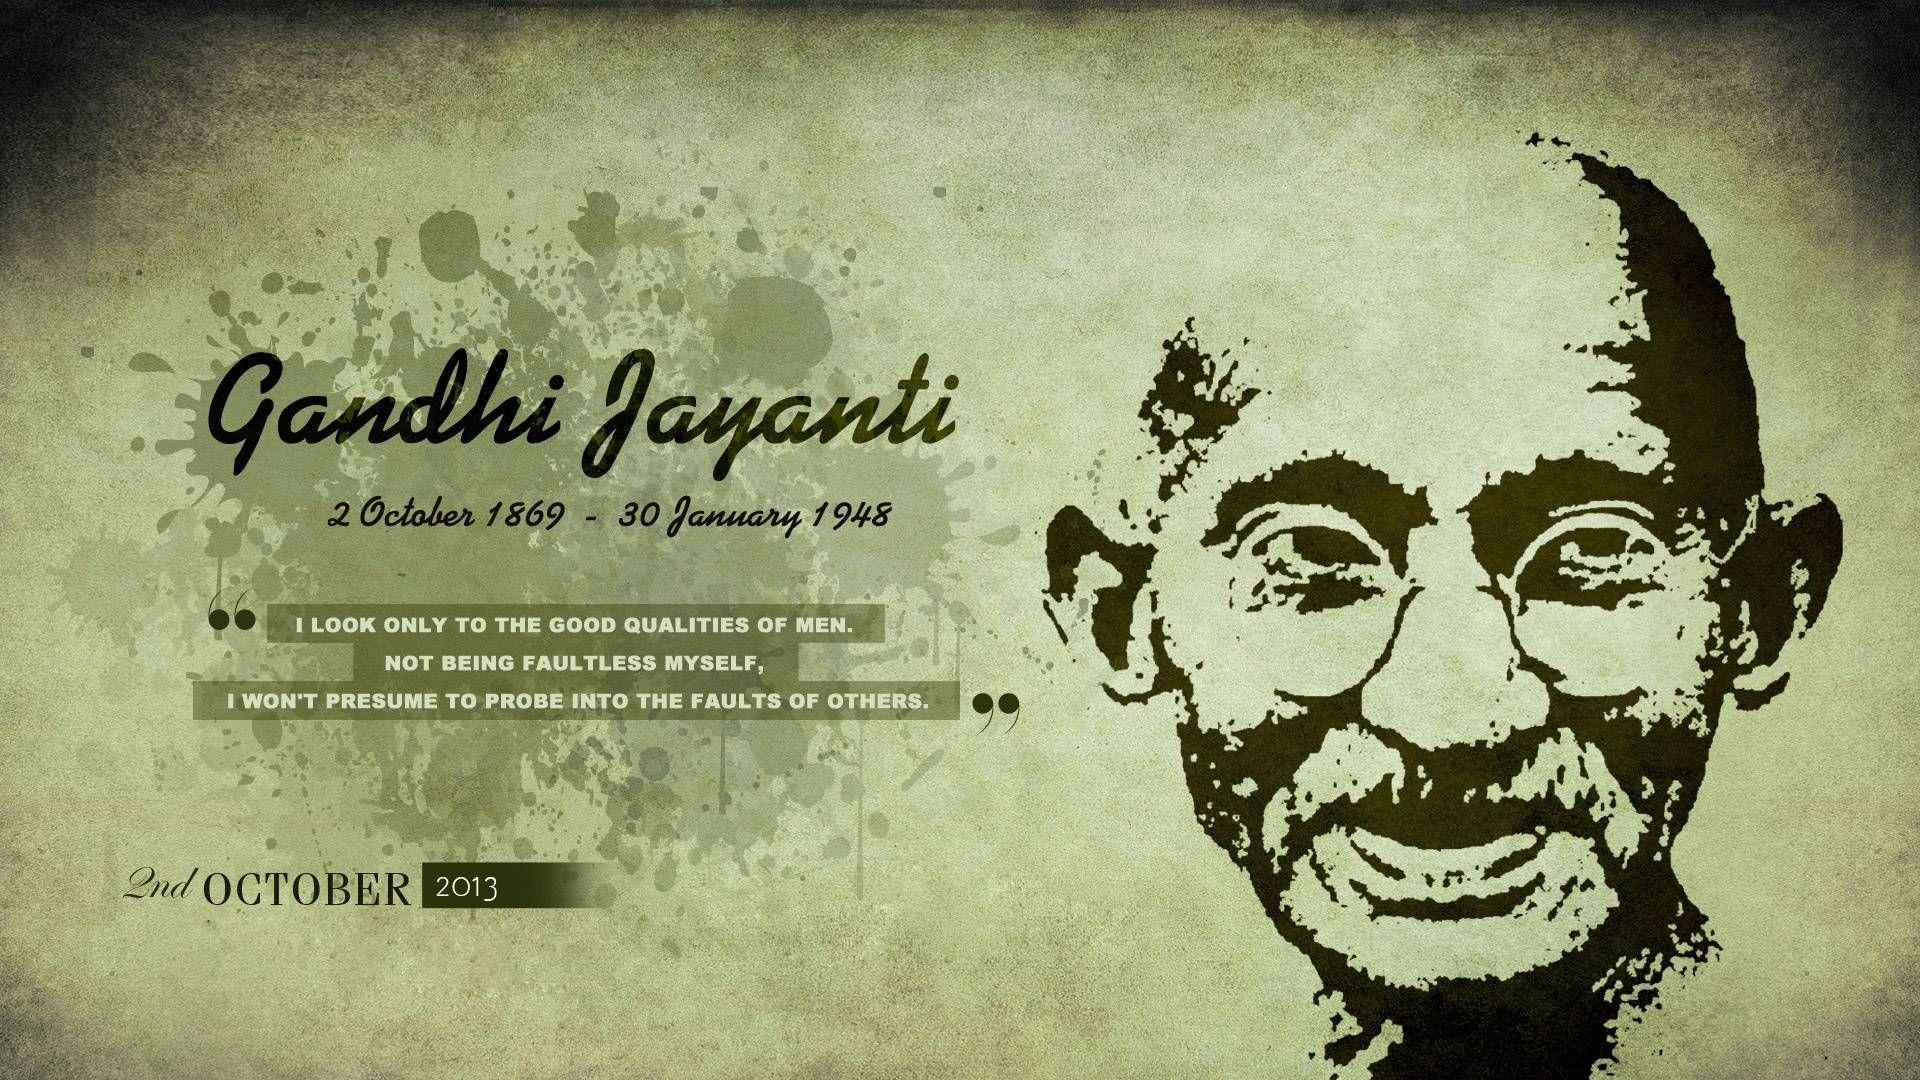 mahatma mohandas karamchand gandhi was the leader of different